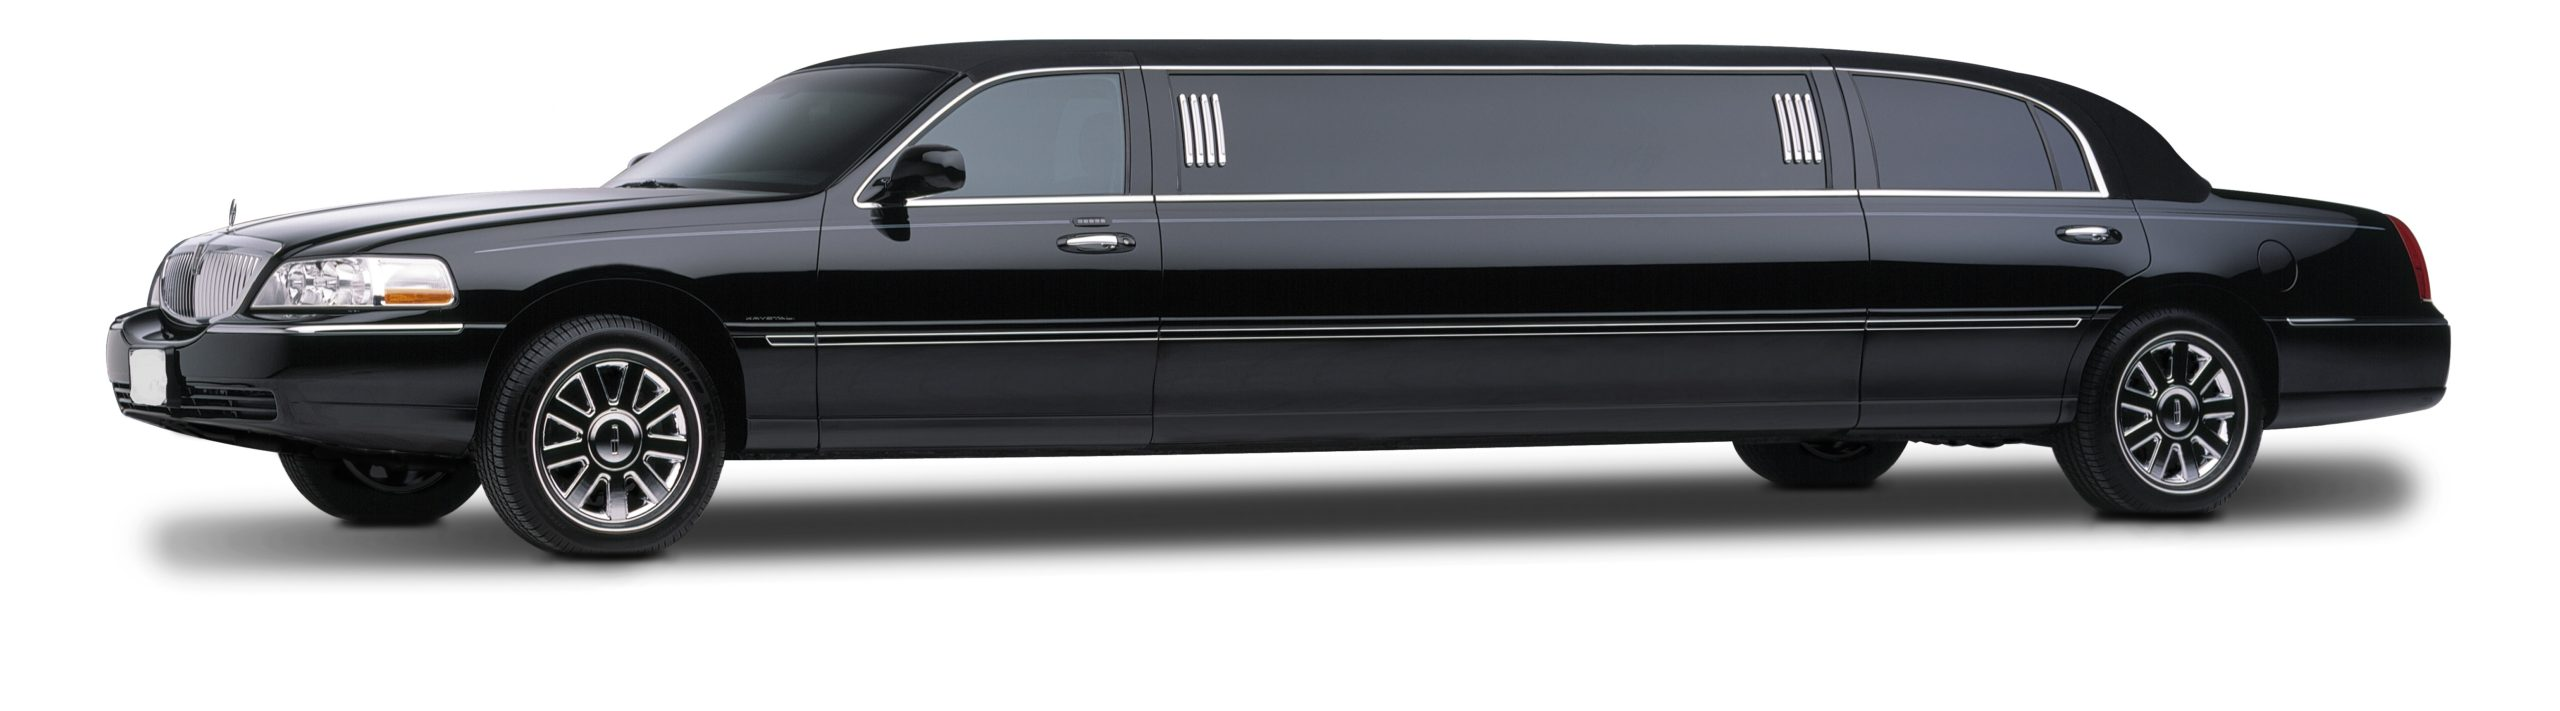 Empire_limousine_10_passenger